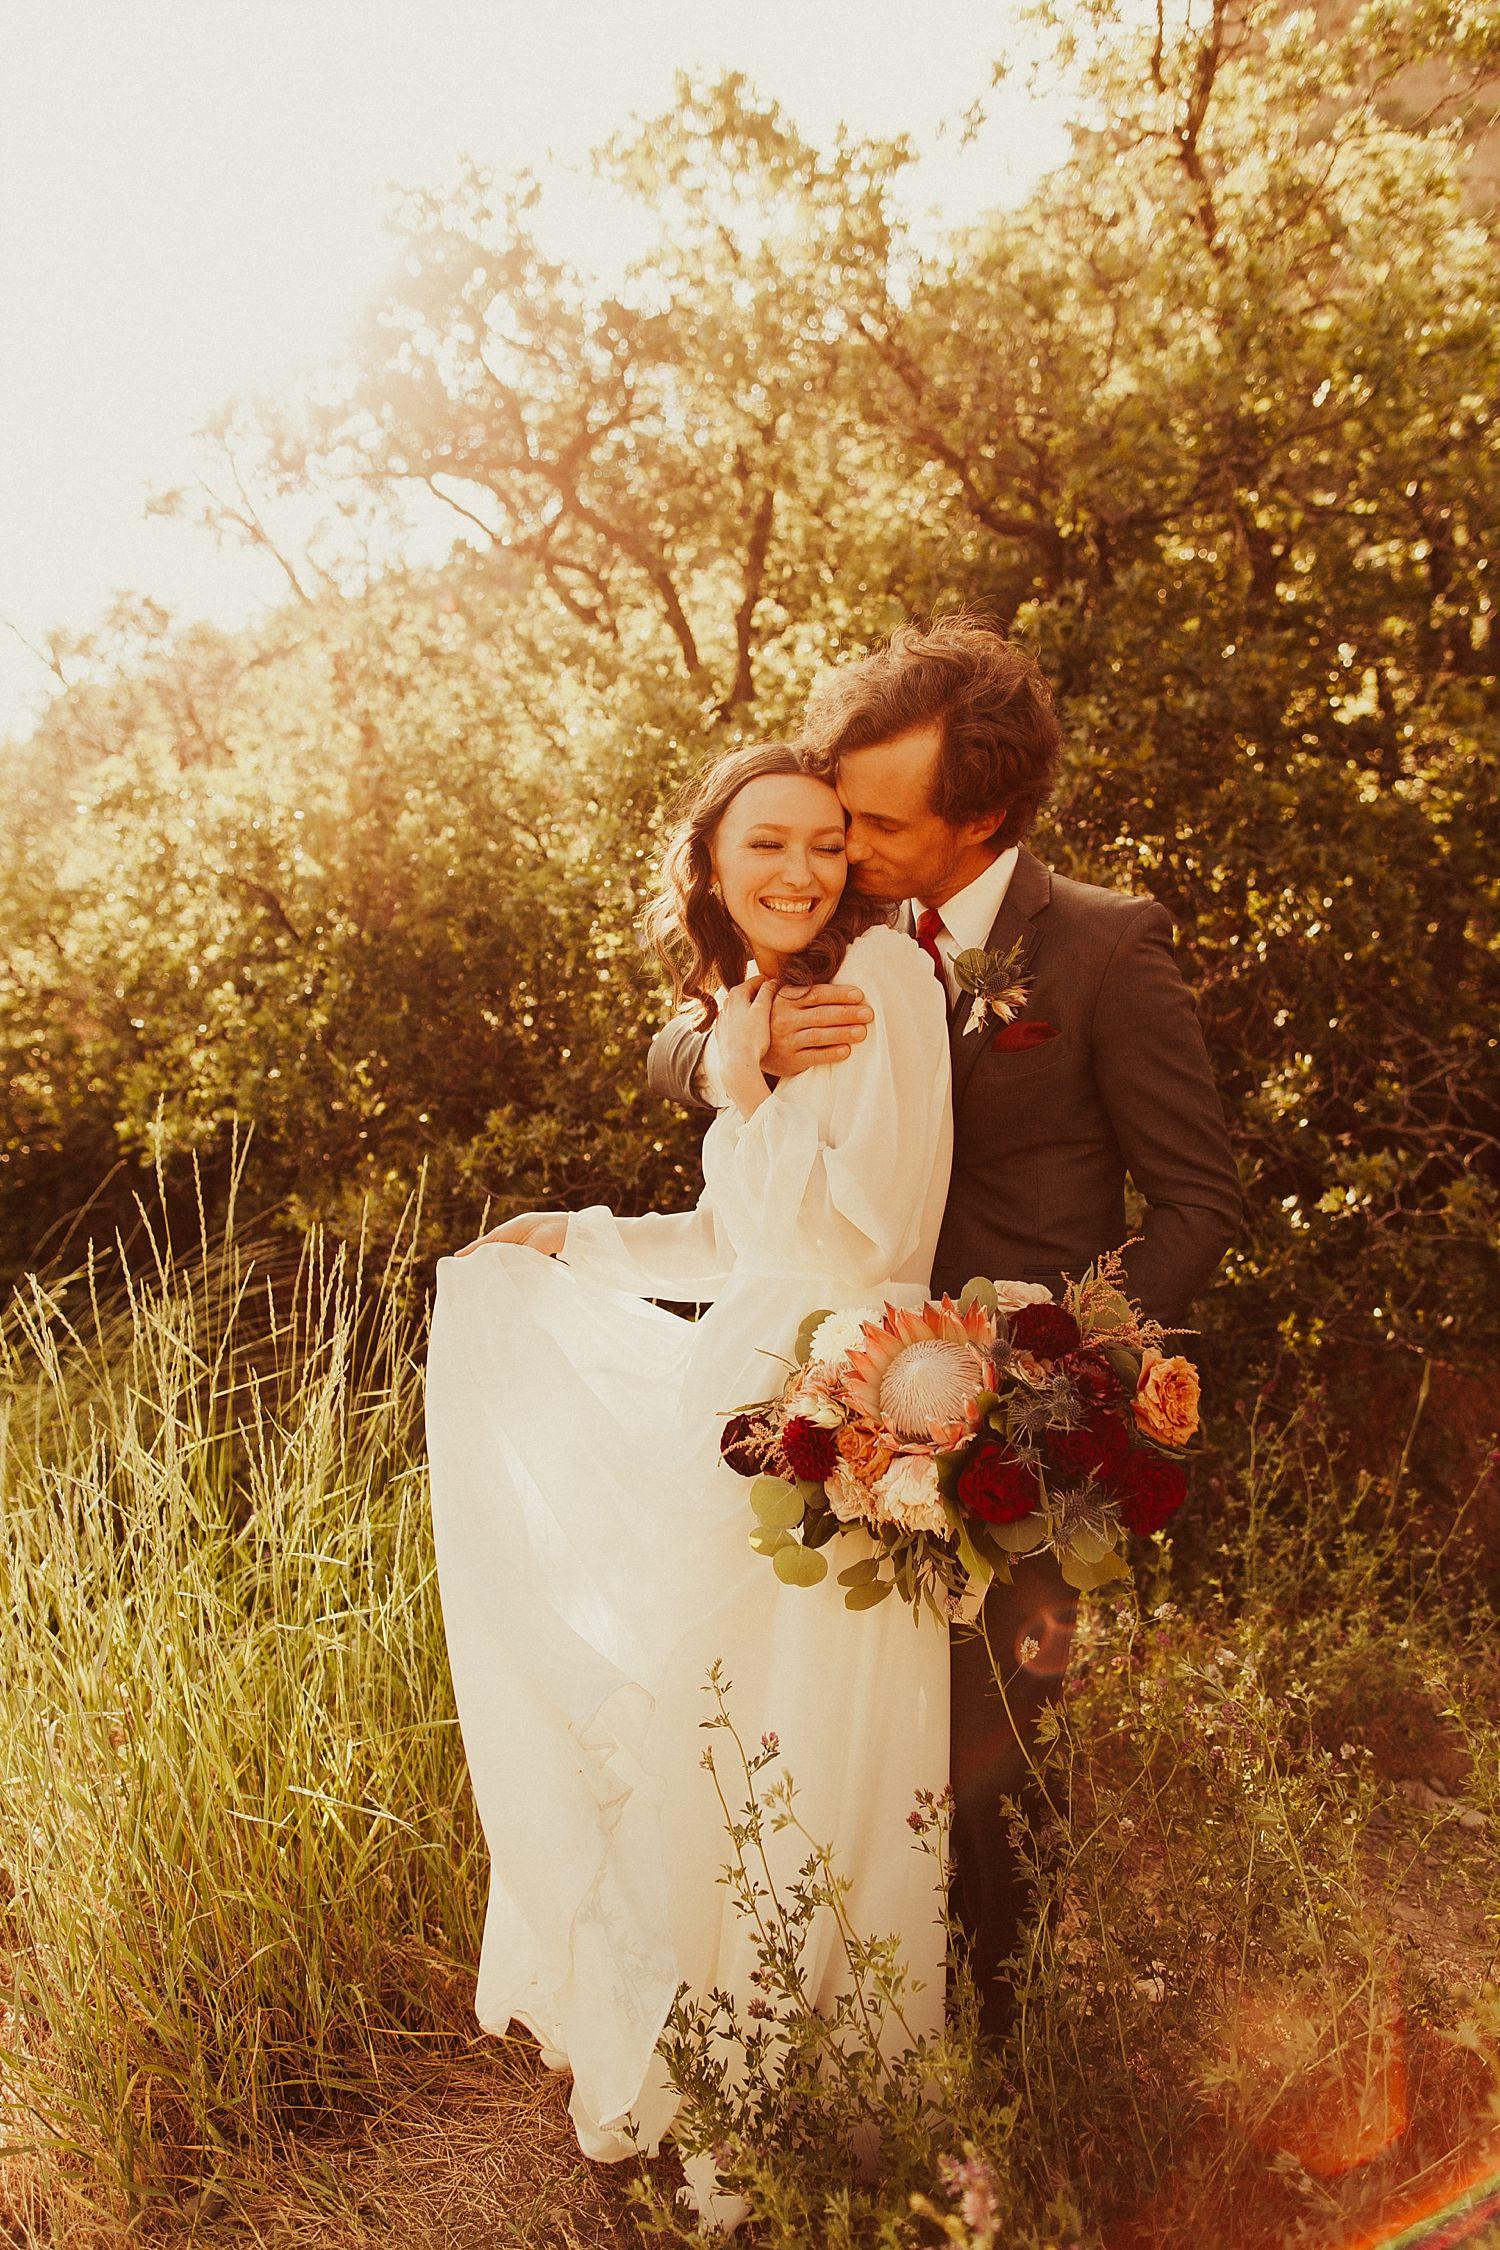 the-startup-building-wedding-provo-utah_3351.jpg